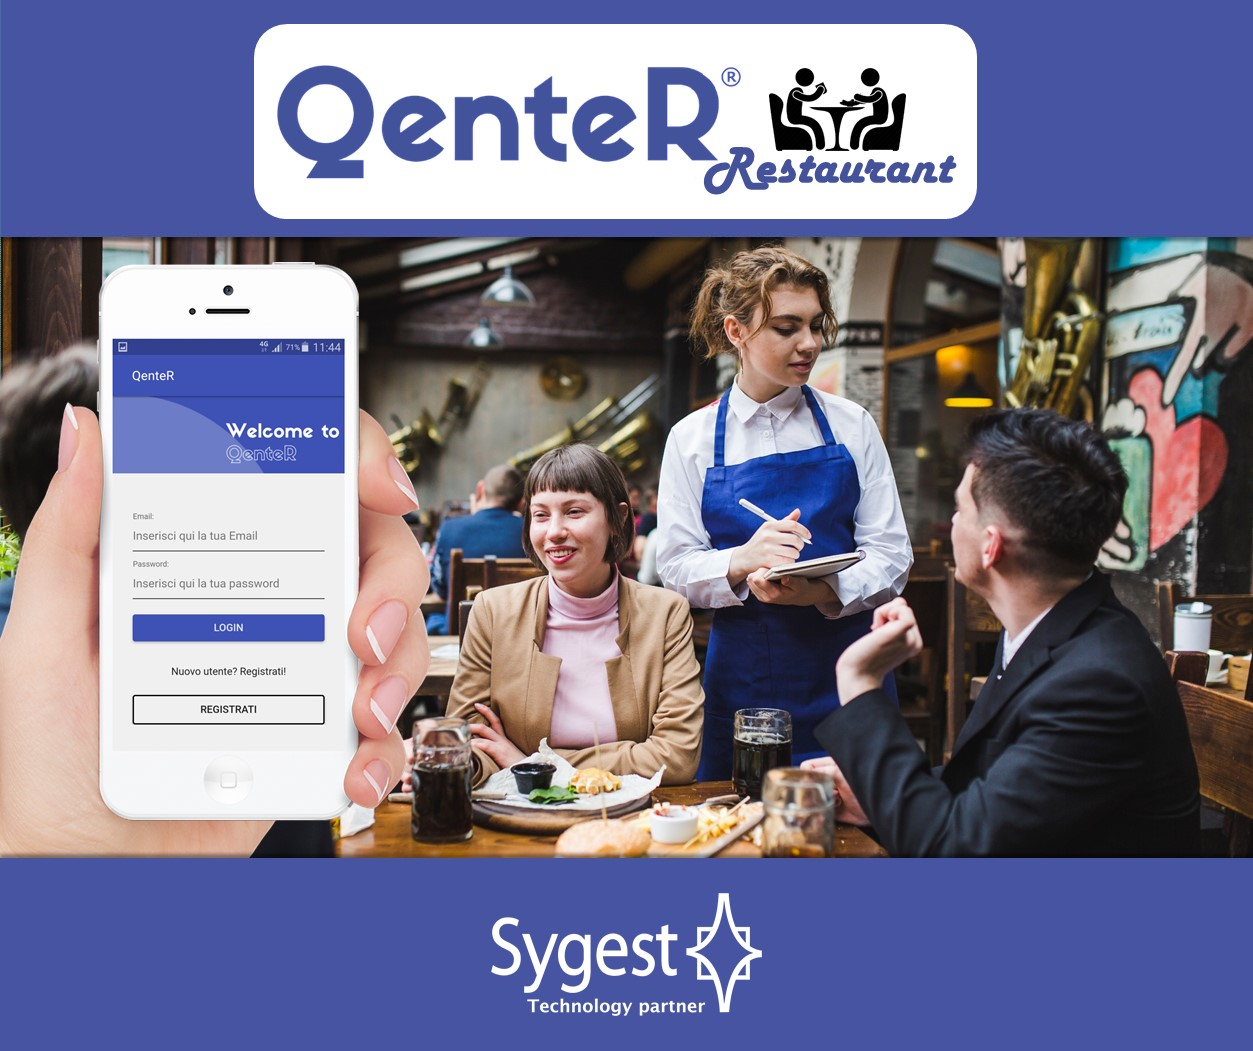 QenteR Restaurant - App prenotazione ristorante | Sygest Srl